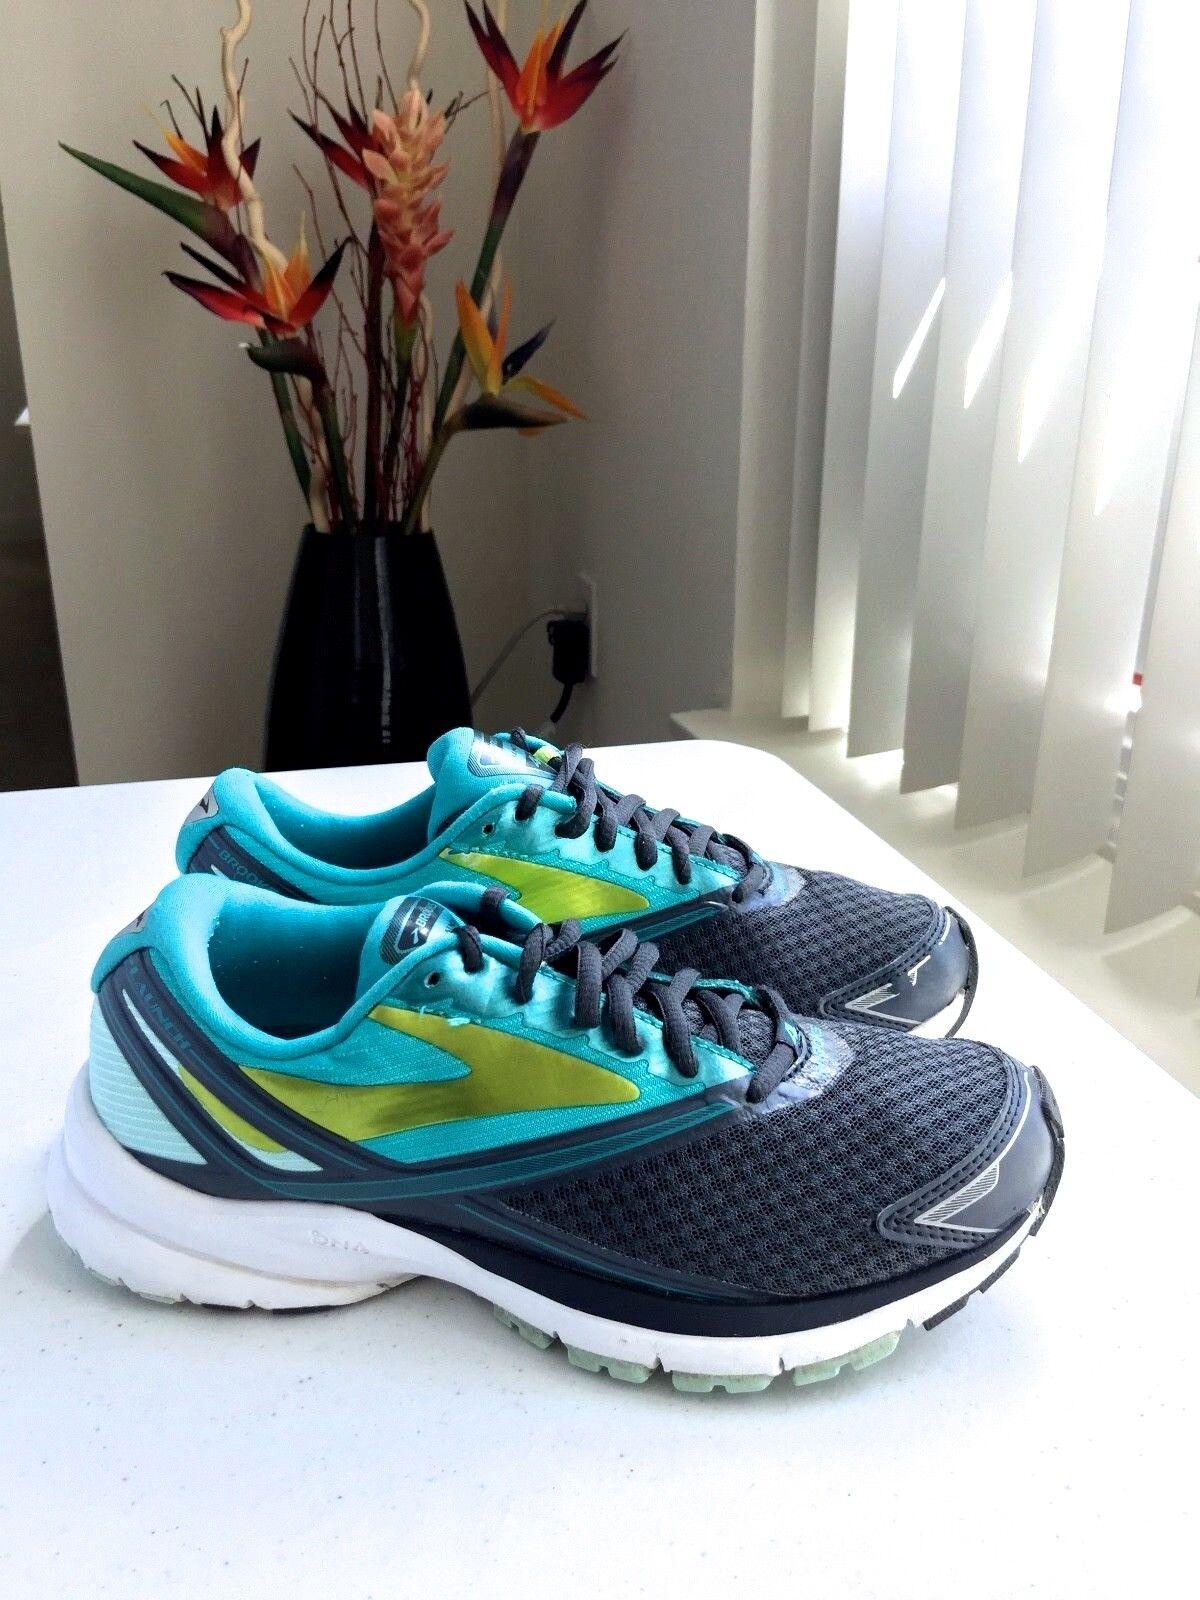 Brooks Launch 4 Running Shoes Women's Sz 10.5 US